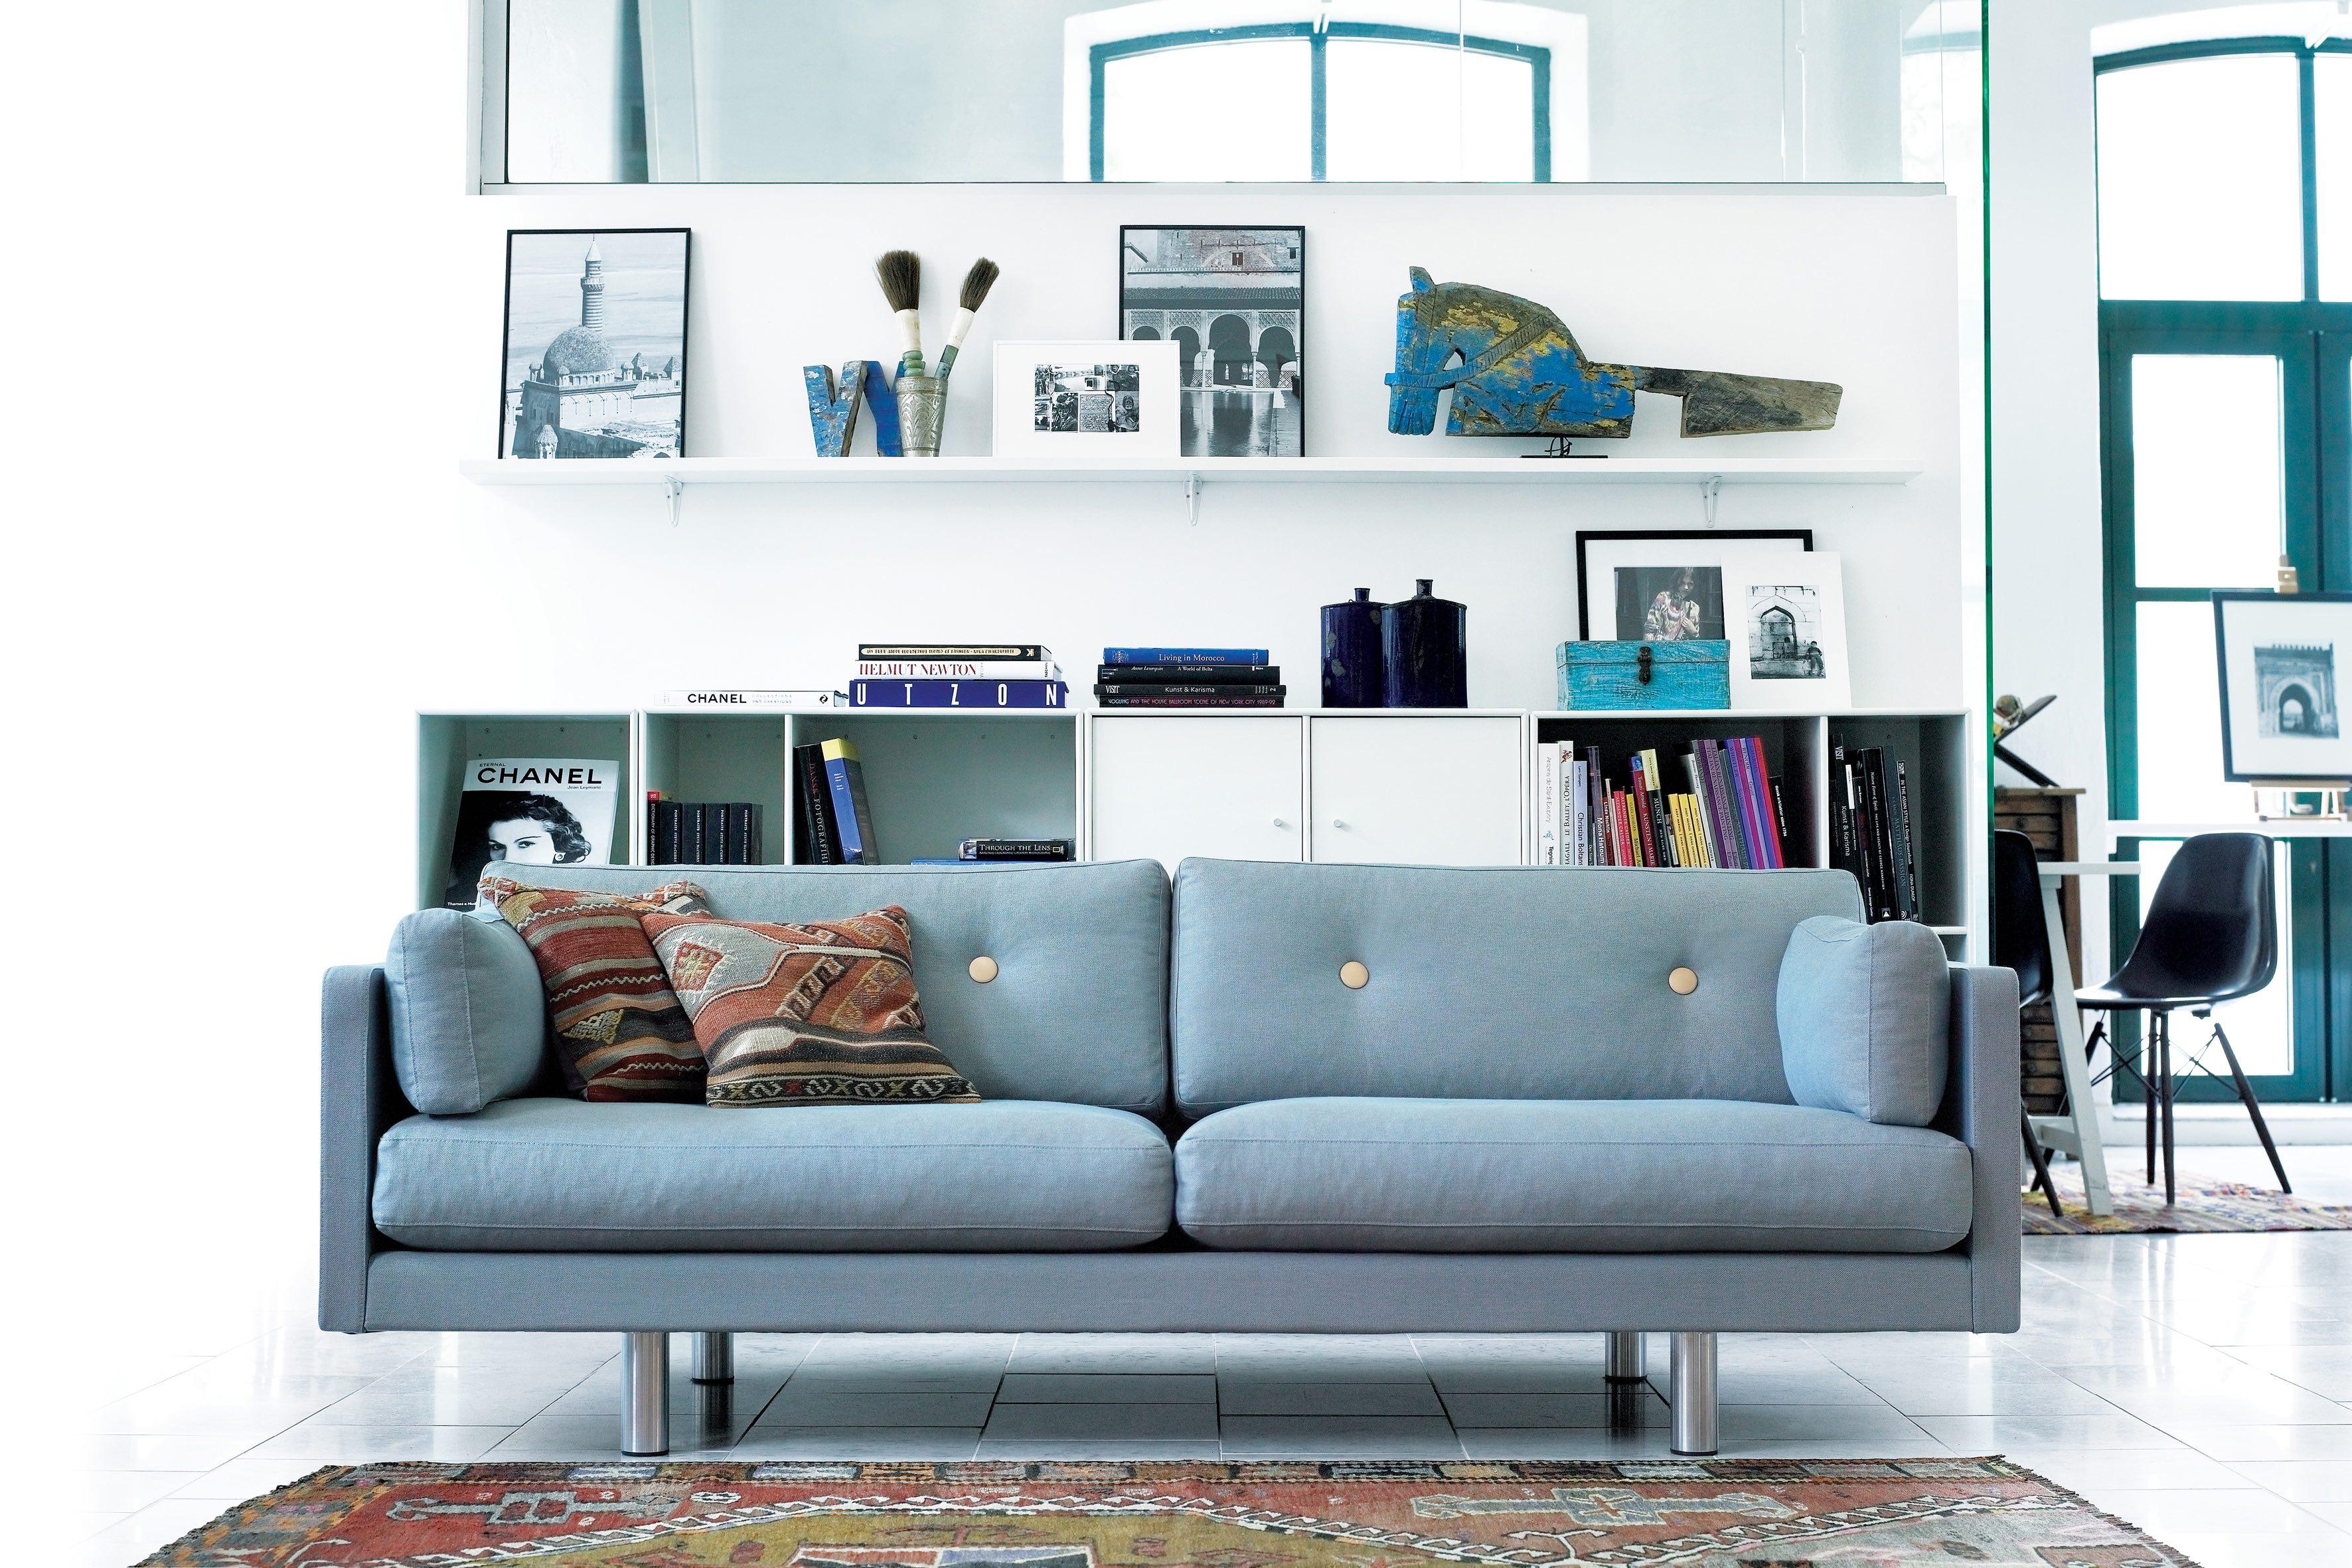 Houzz announces 2017 winner in design for Design danese arredamento